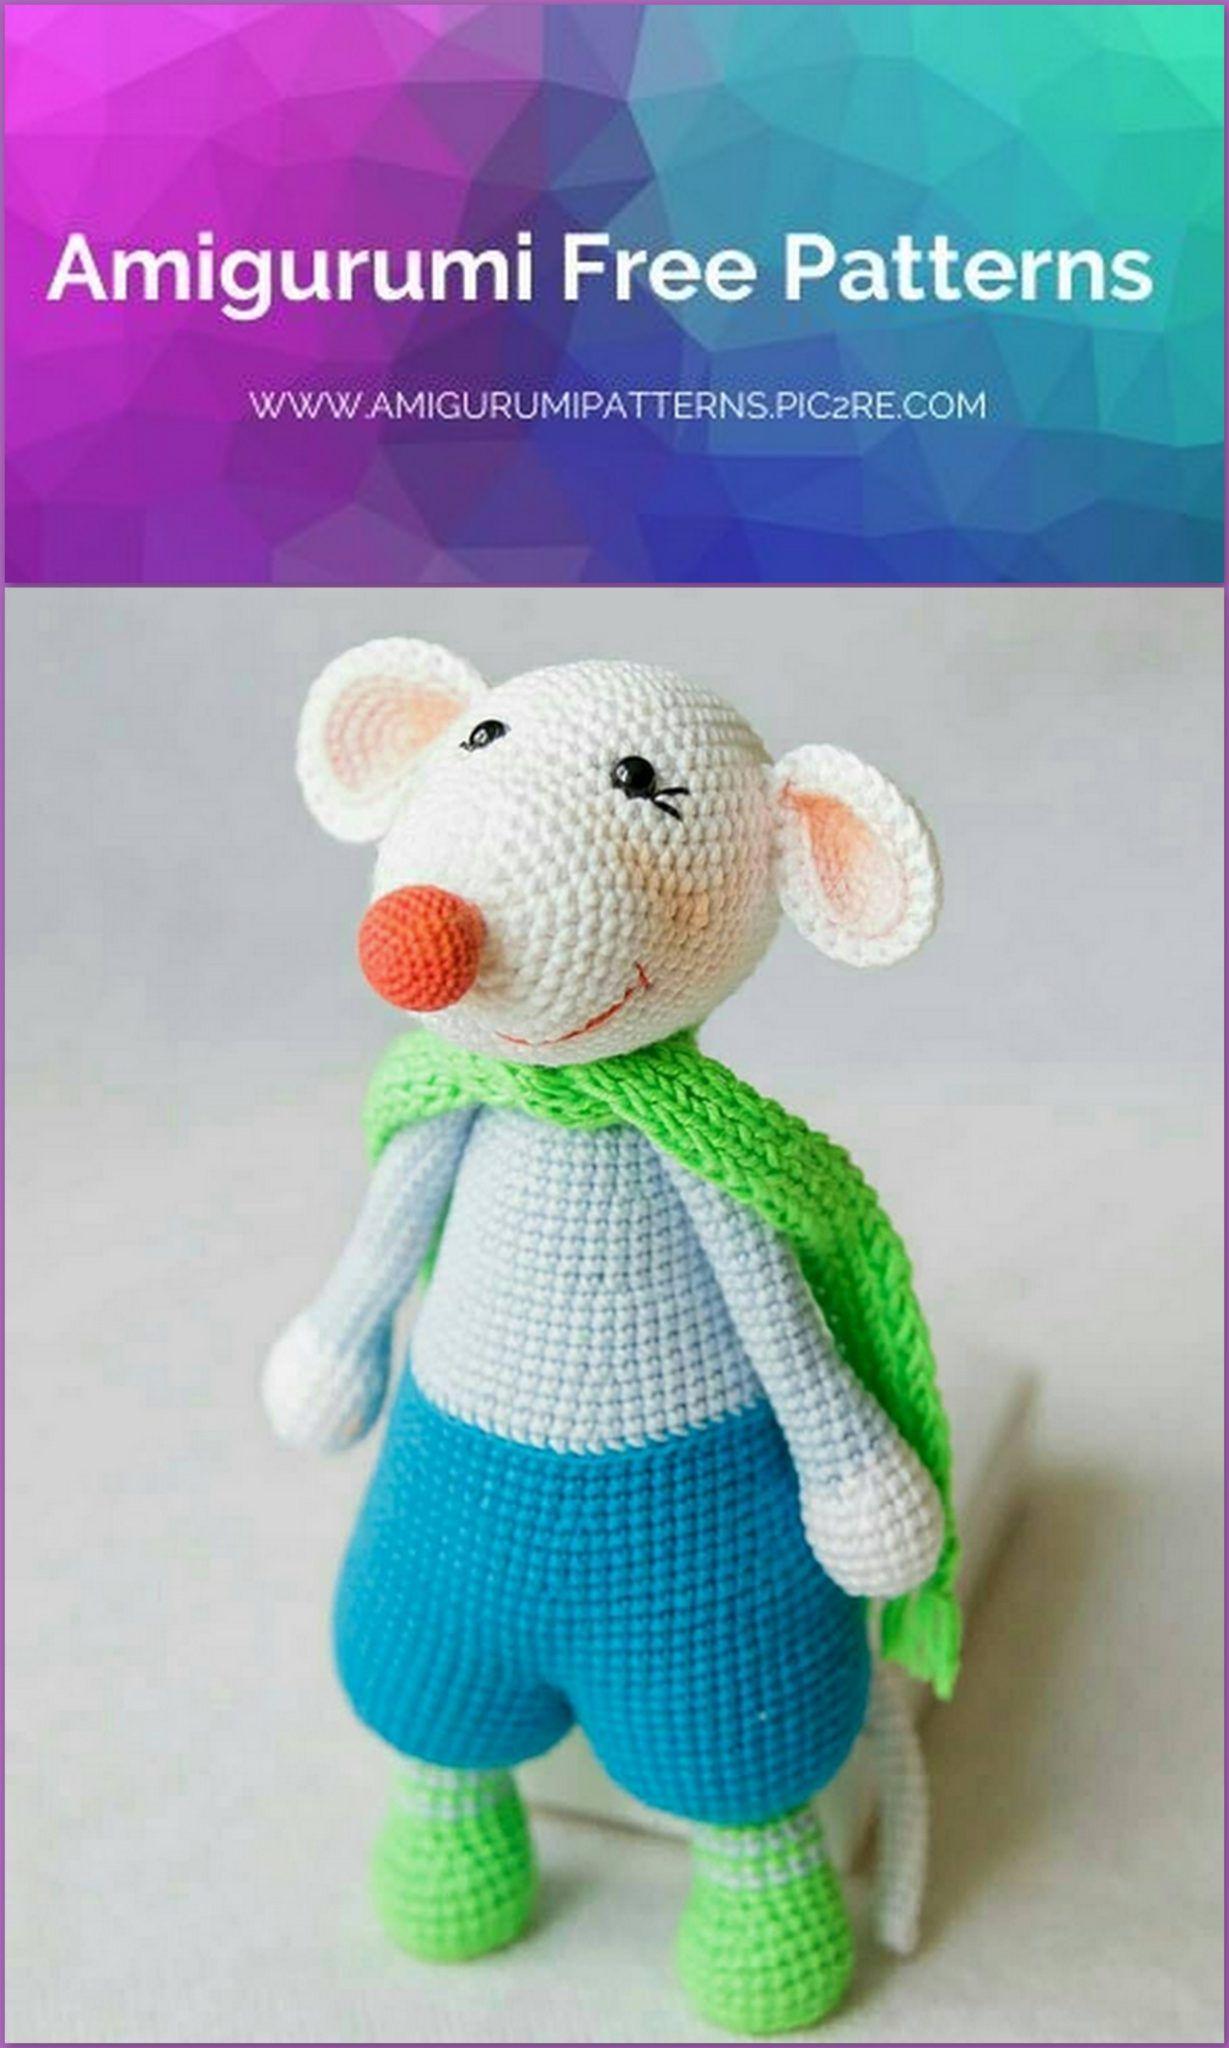 Made by Jenn F (Lalylala) | Puppen, Selbermachen | 2048x1229